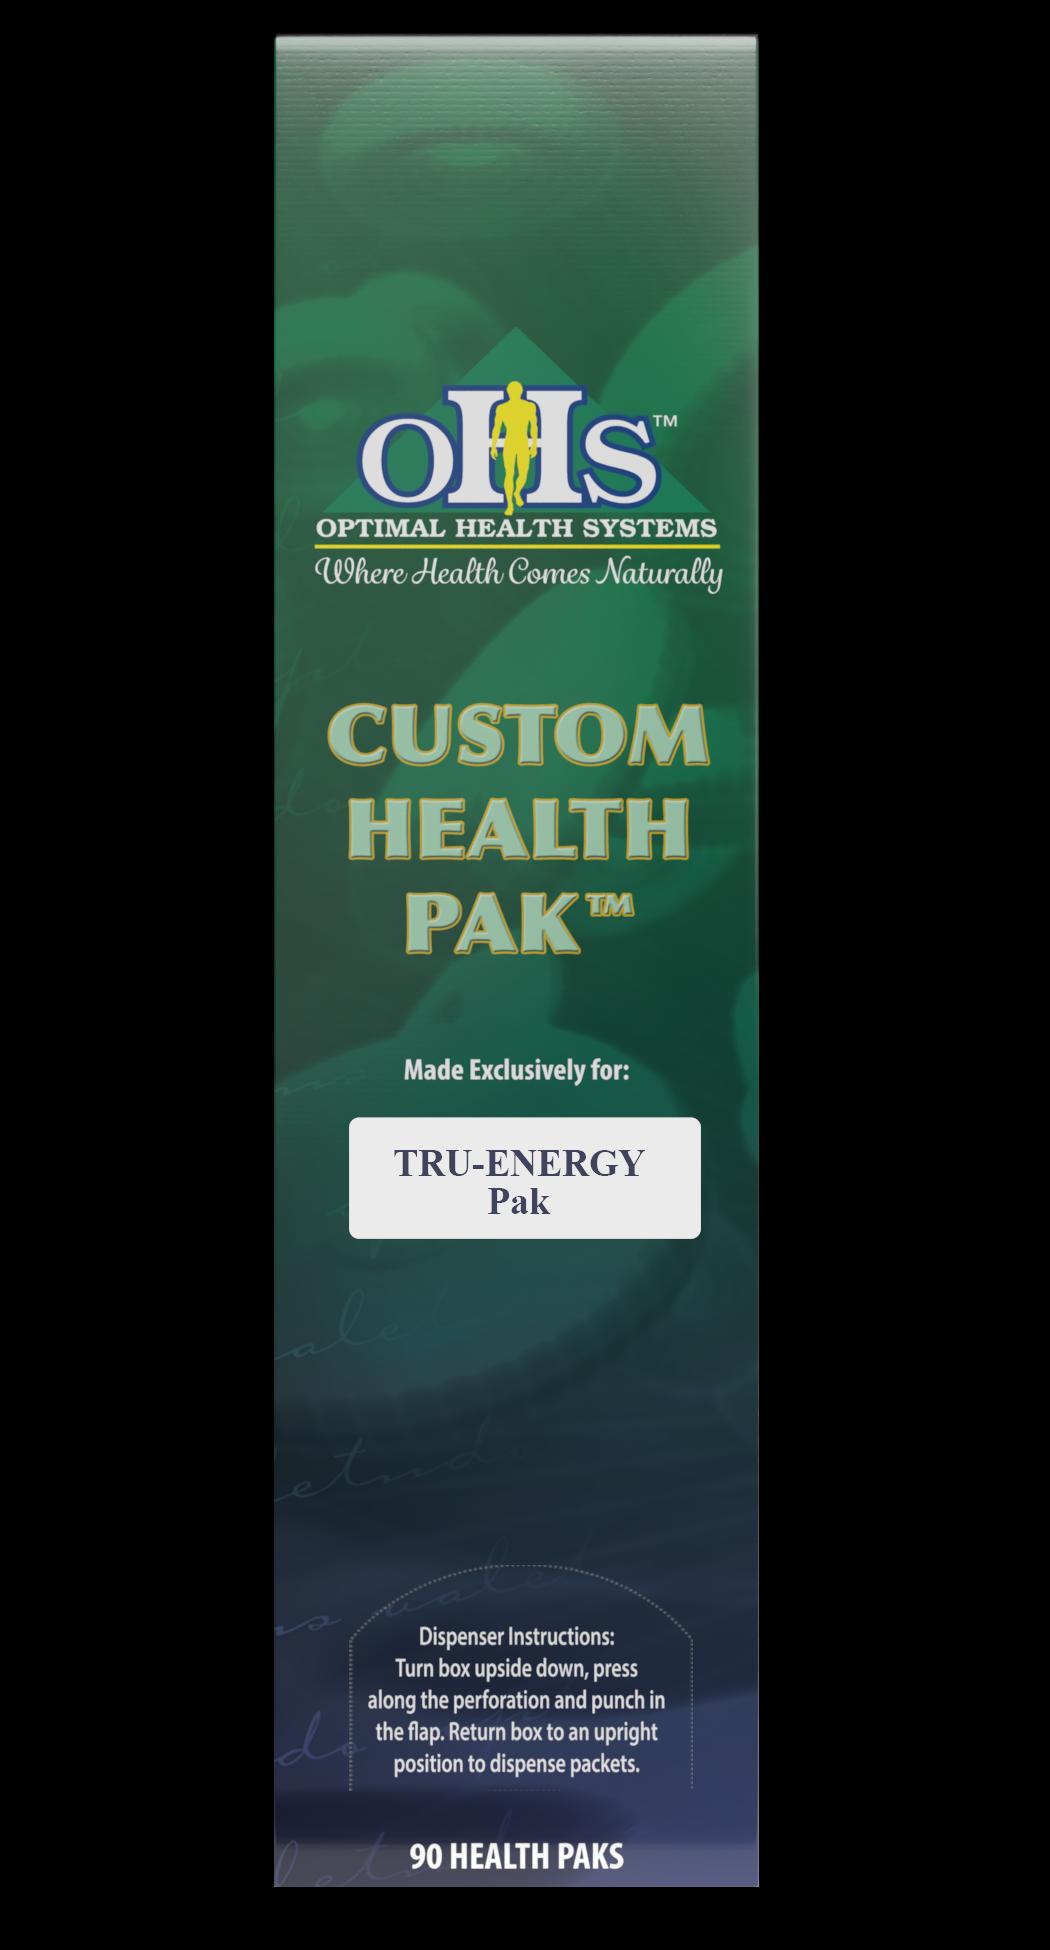 Tru-Energy Pak